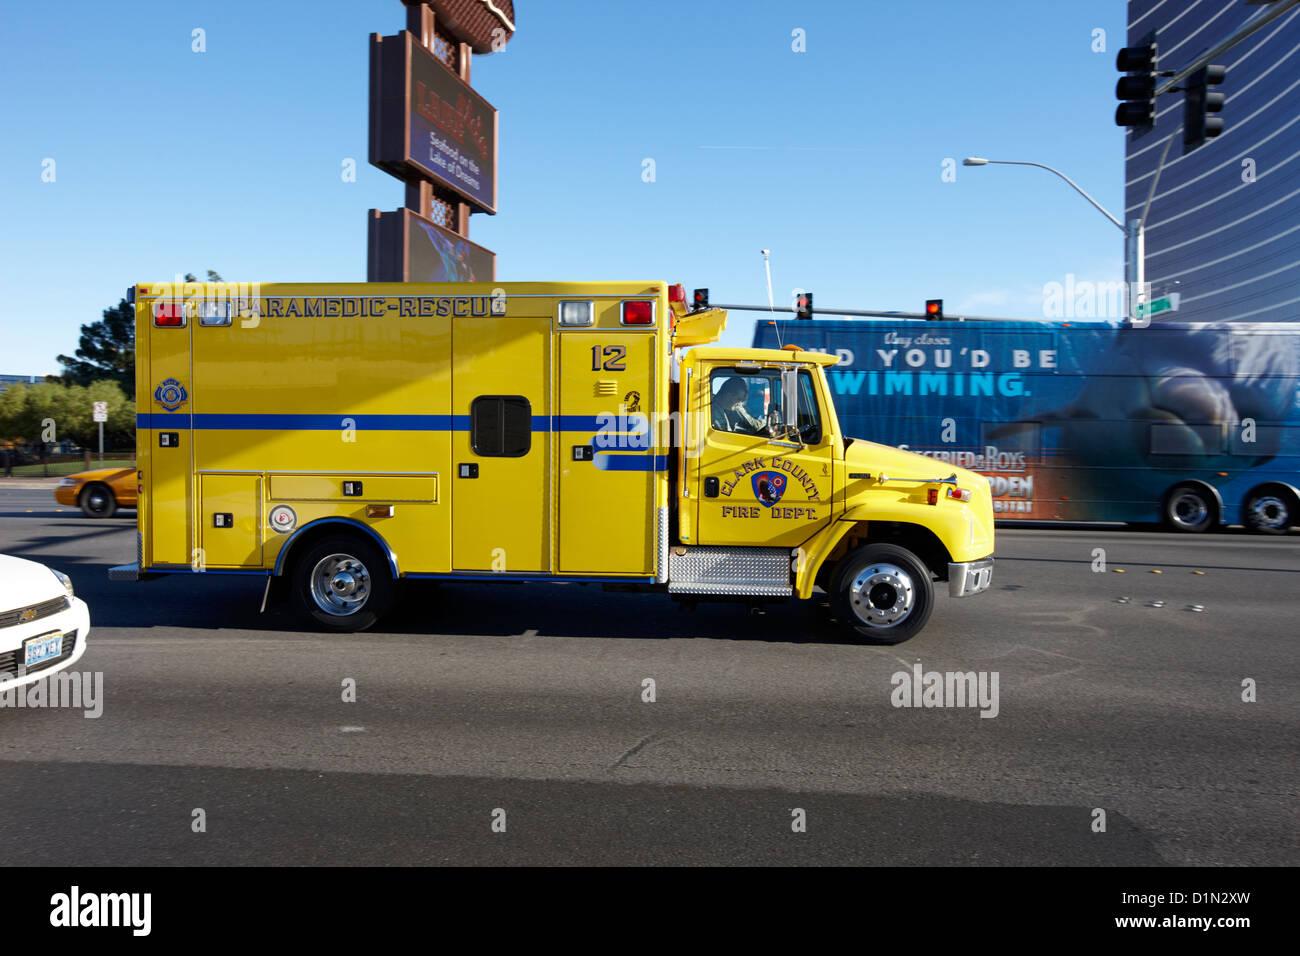 clark county fire and rescue paramedics ambulance Nevada USA - Stock Image